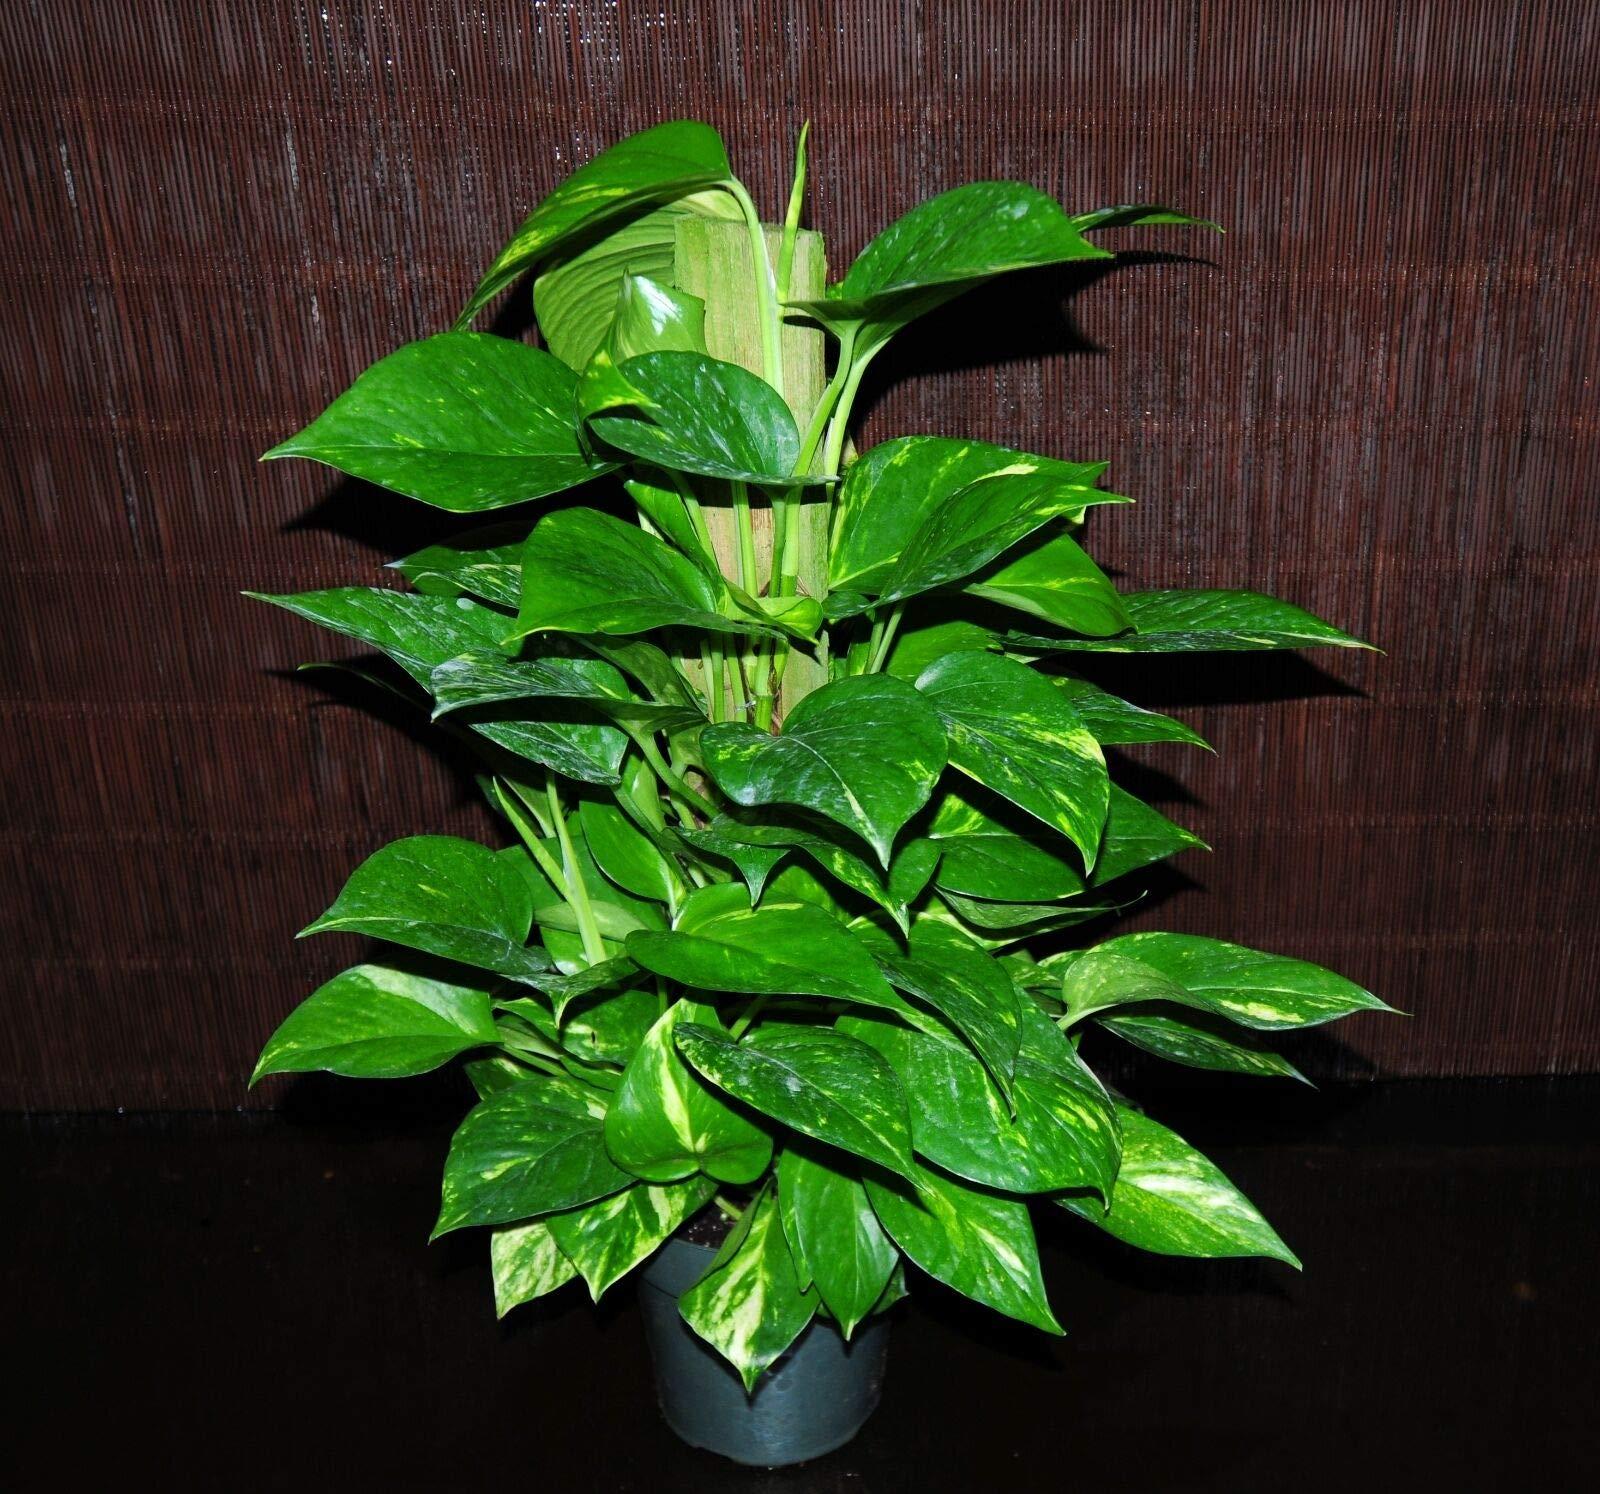 Golden Pothos 6'' Totem Pole~ Tropical Vining House Plant Super Large & Full (Premium Quality) by AY-Premium